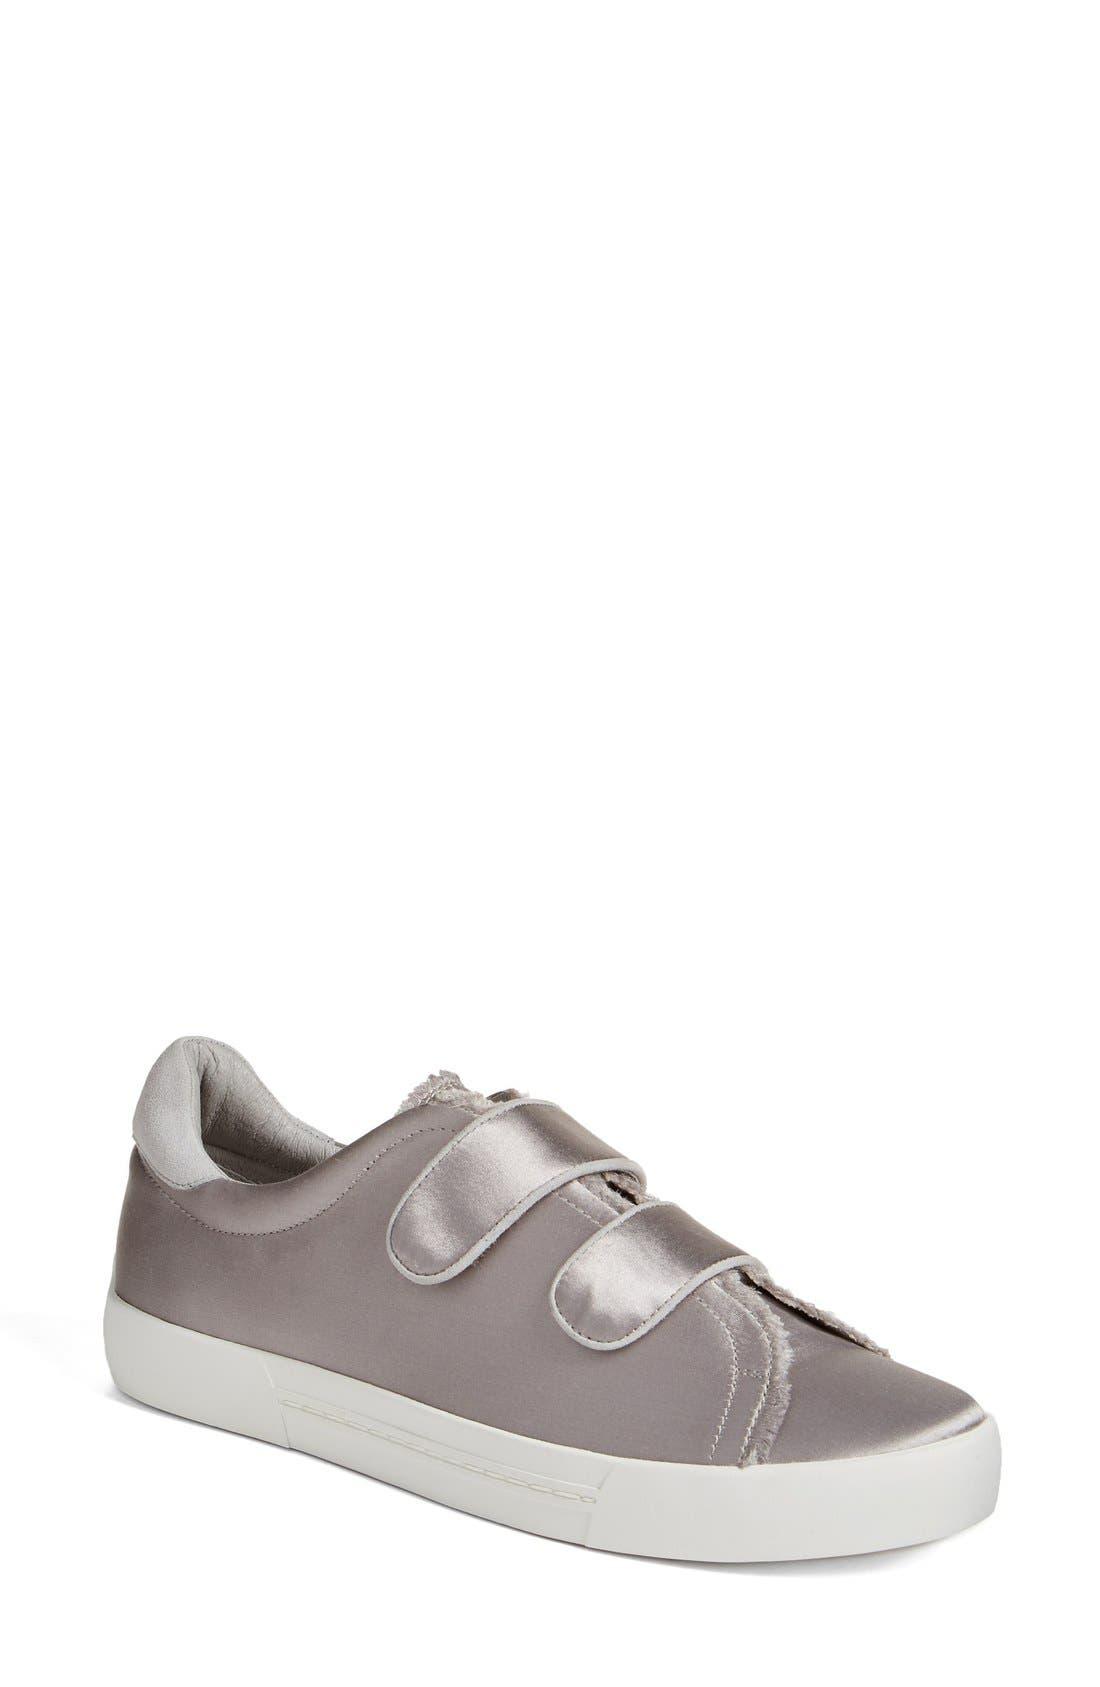 Main Image - Joie 'Diata' Low Top Sneaker (Women)